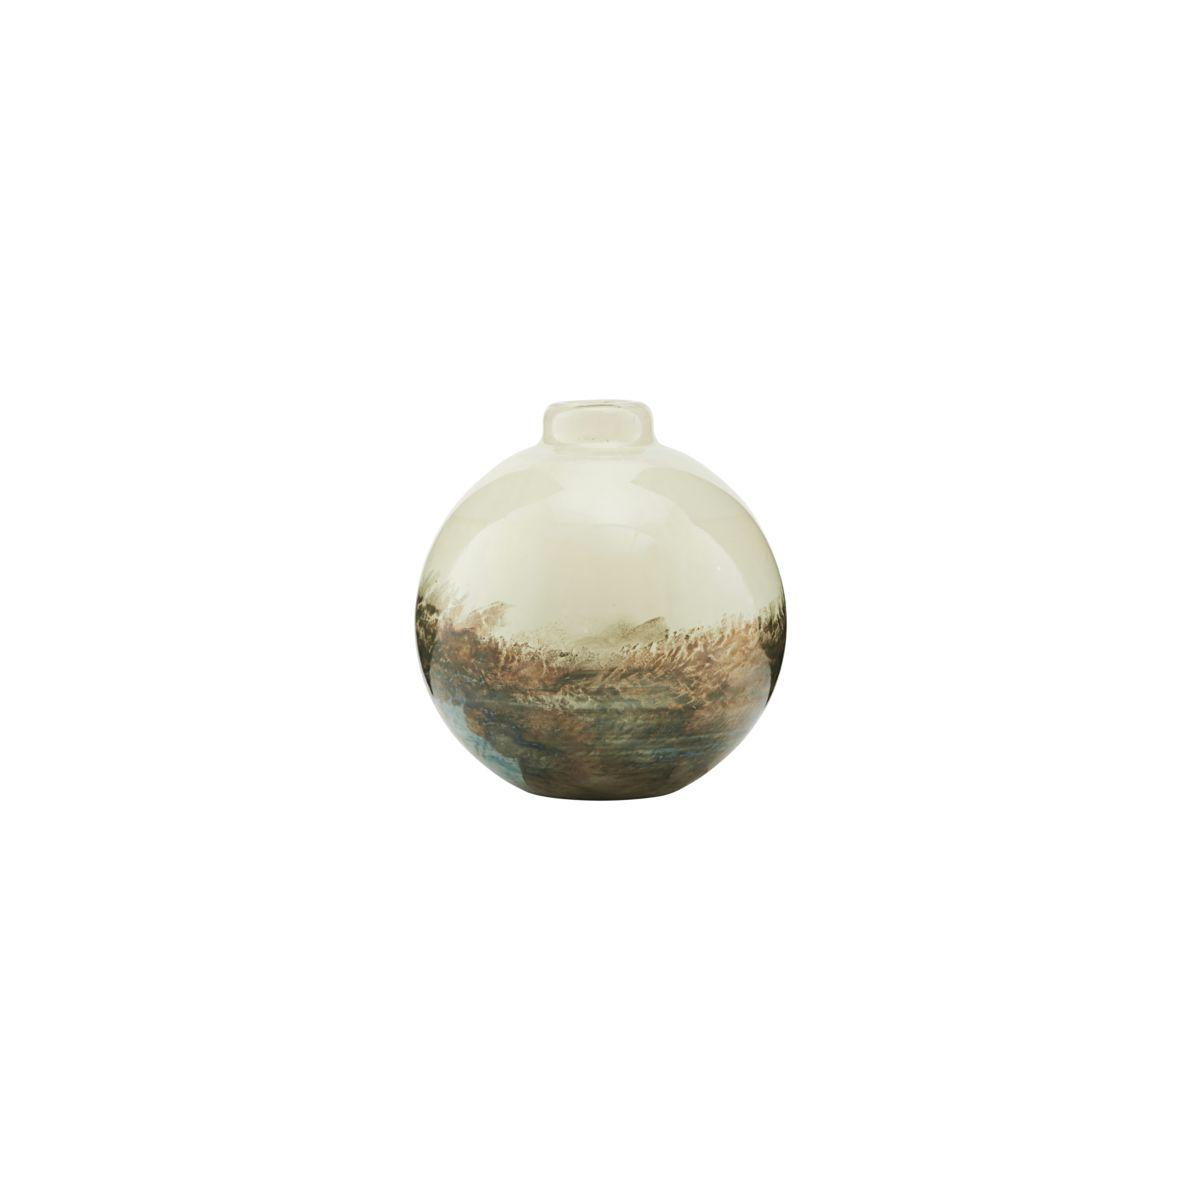 Vas, Earth, Beige / Metallic House Doctor